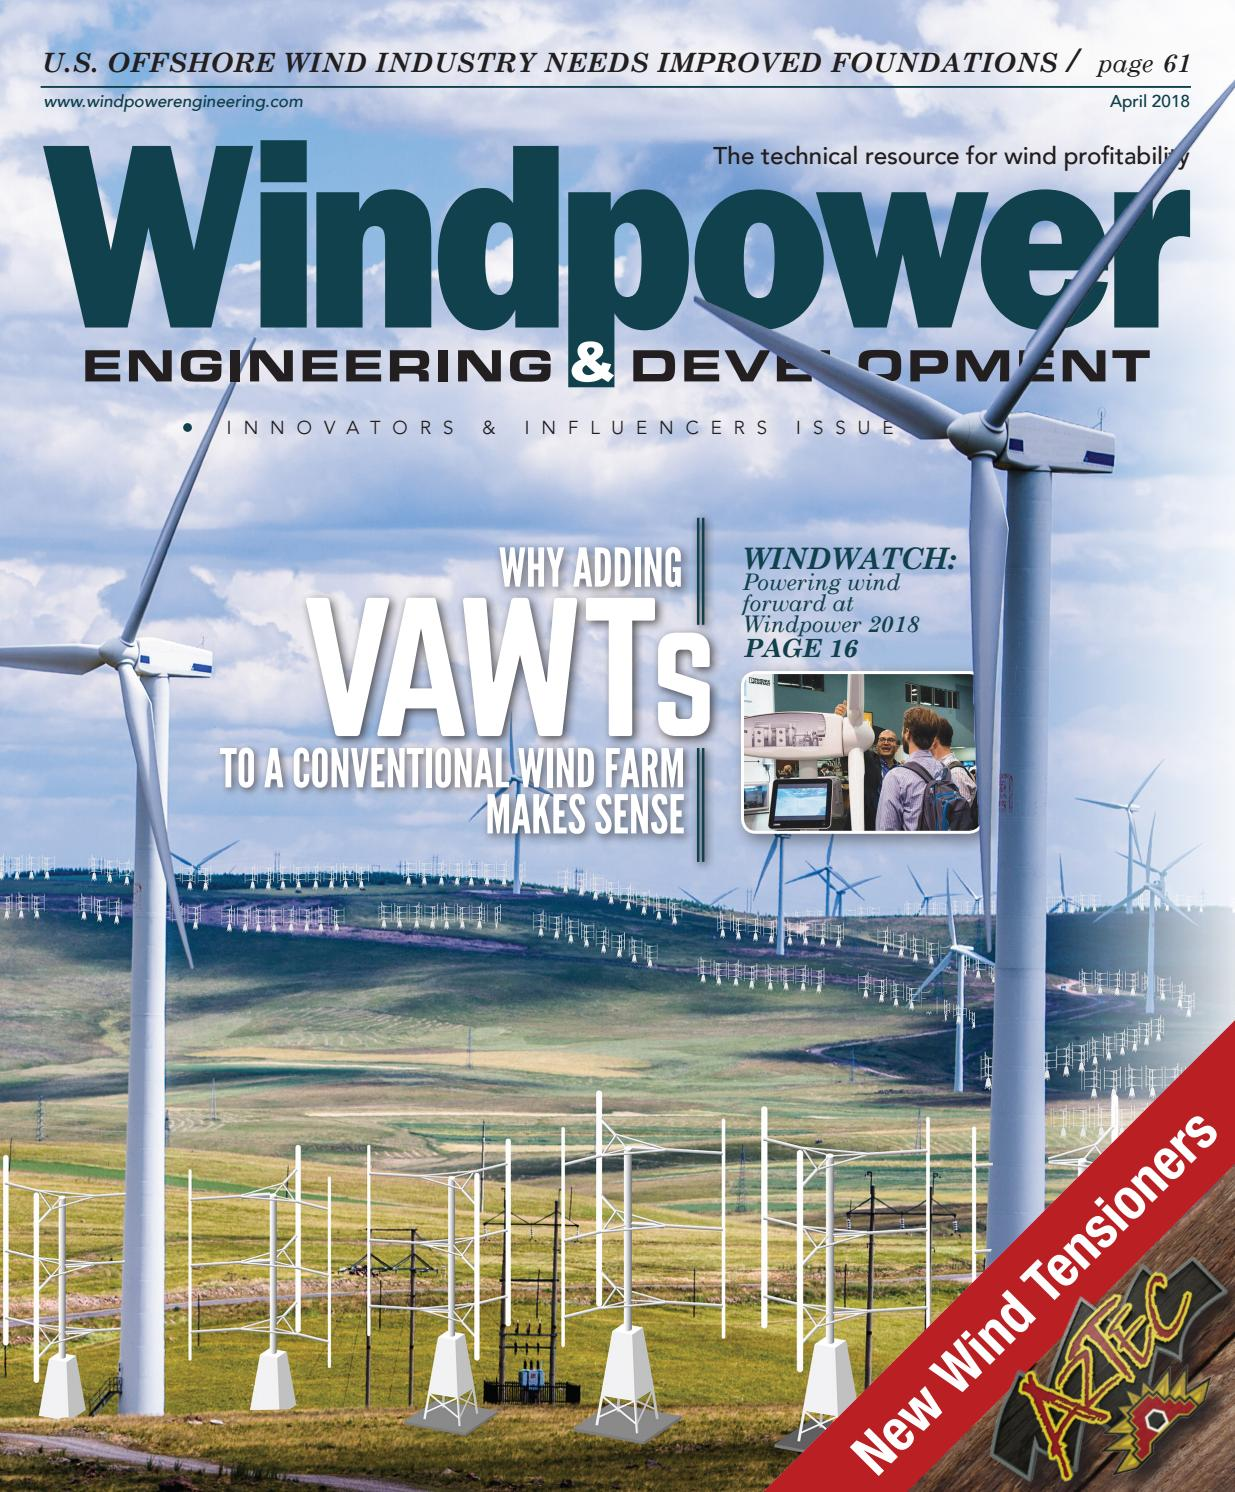 Windpower Engineering Development April 2018 By Wtwh Media Llc Towers Great Rock Issuu